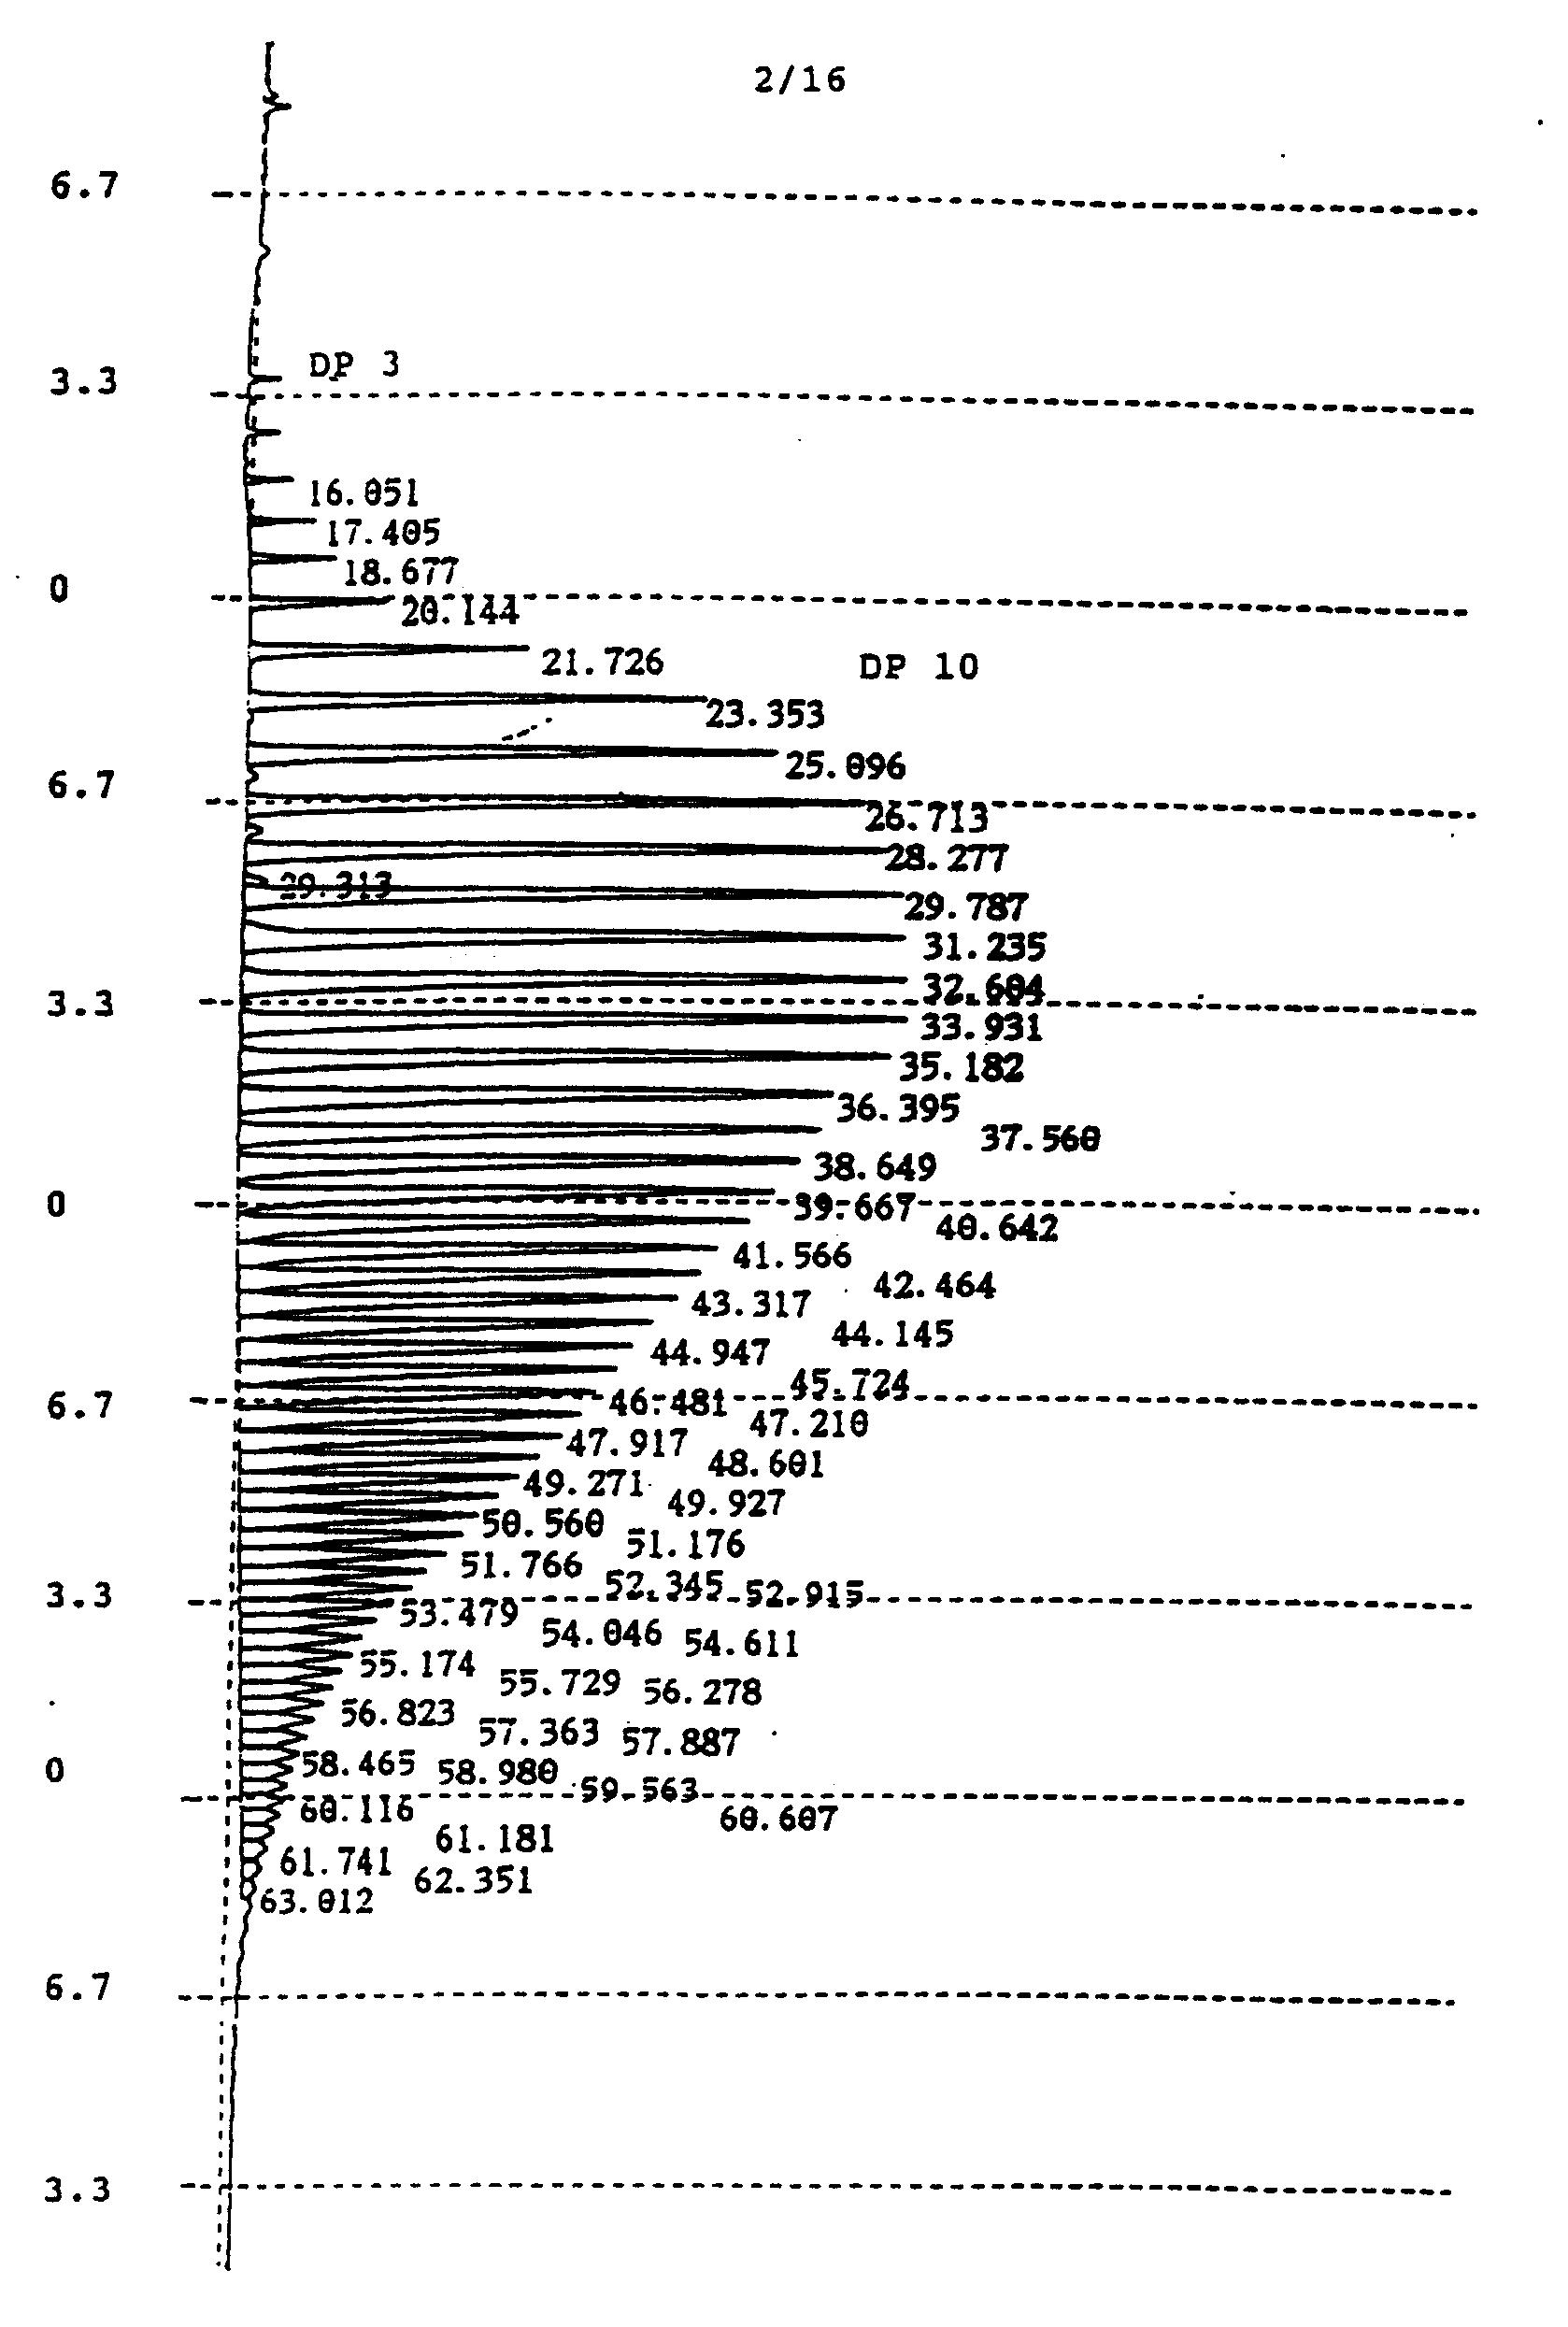 KR100374233B1 - Disperse composition - Google Patents